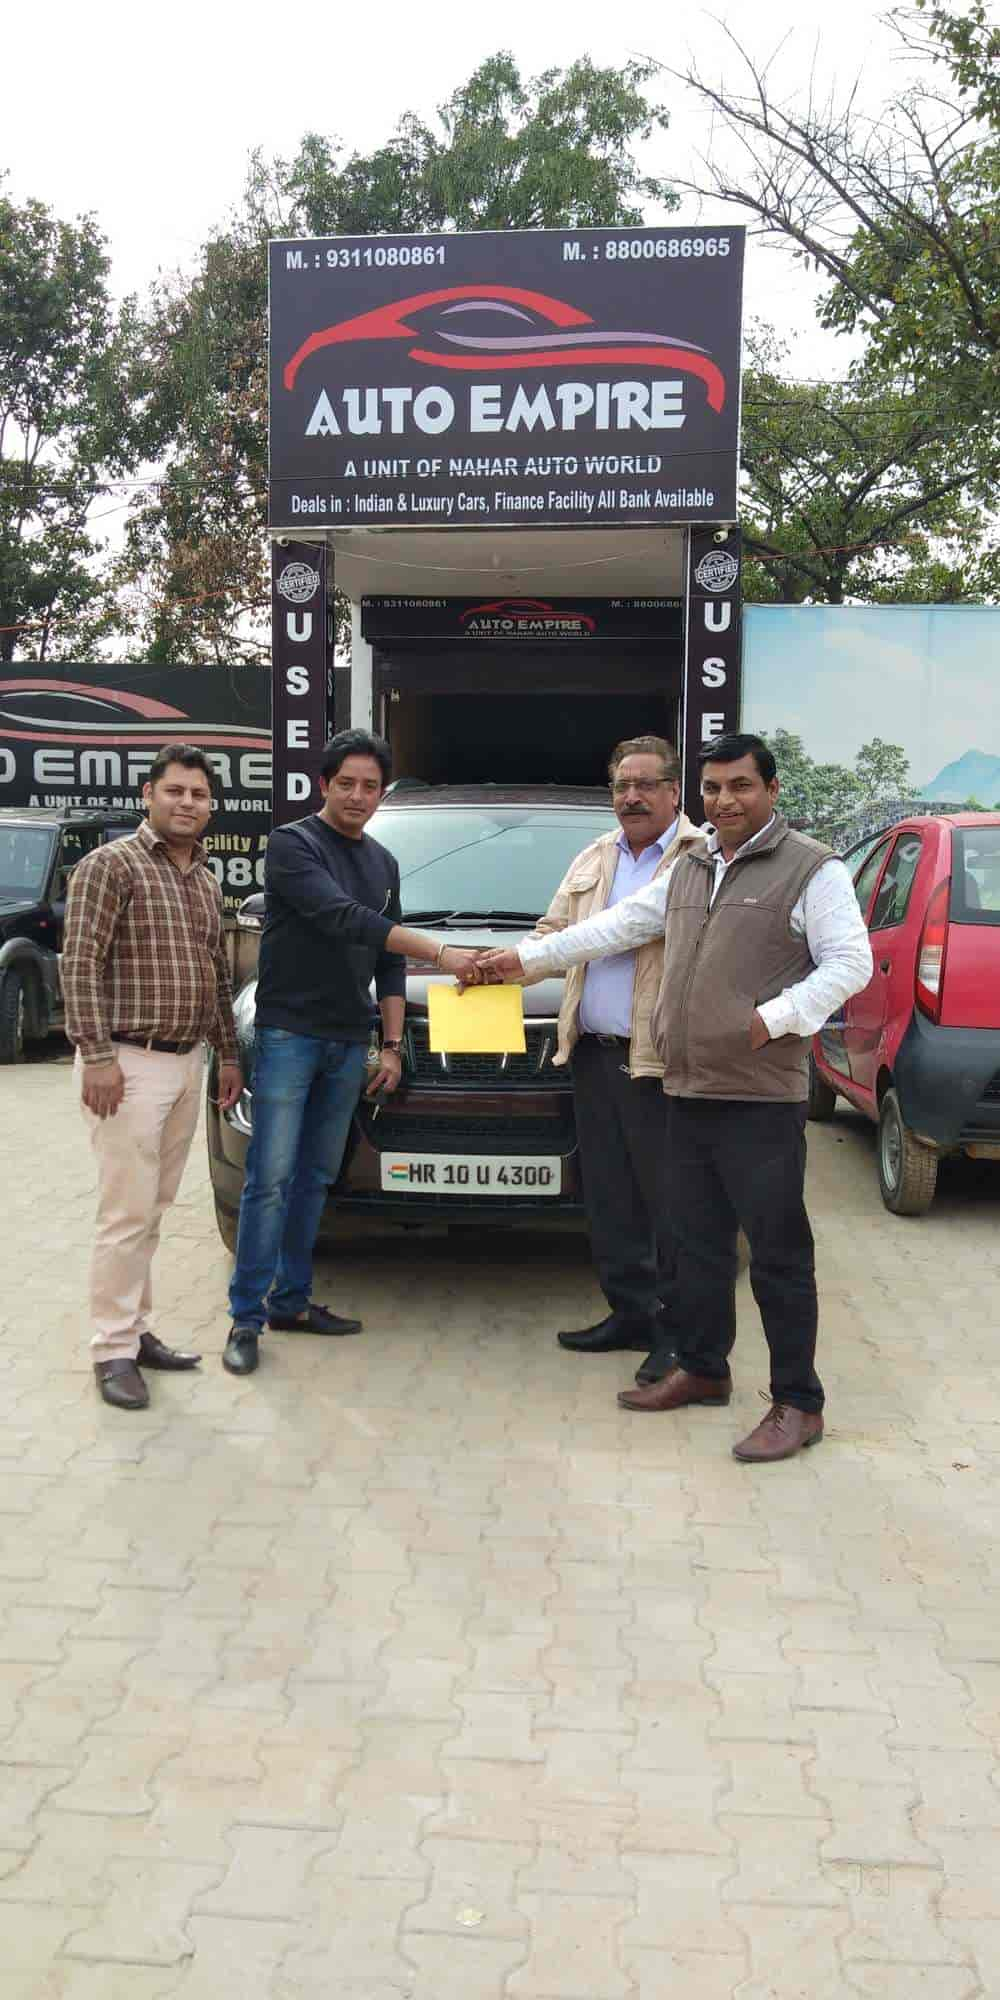 Auto Empire, IFFCO Chowk - Second Hand Car Dealers in Gurgaon, Delhi